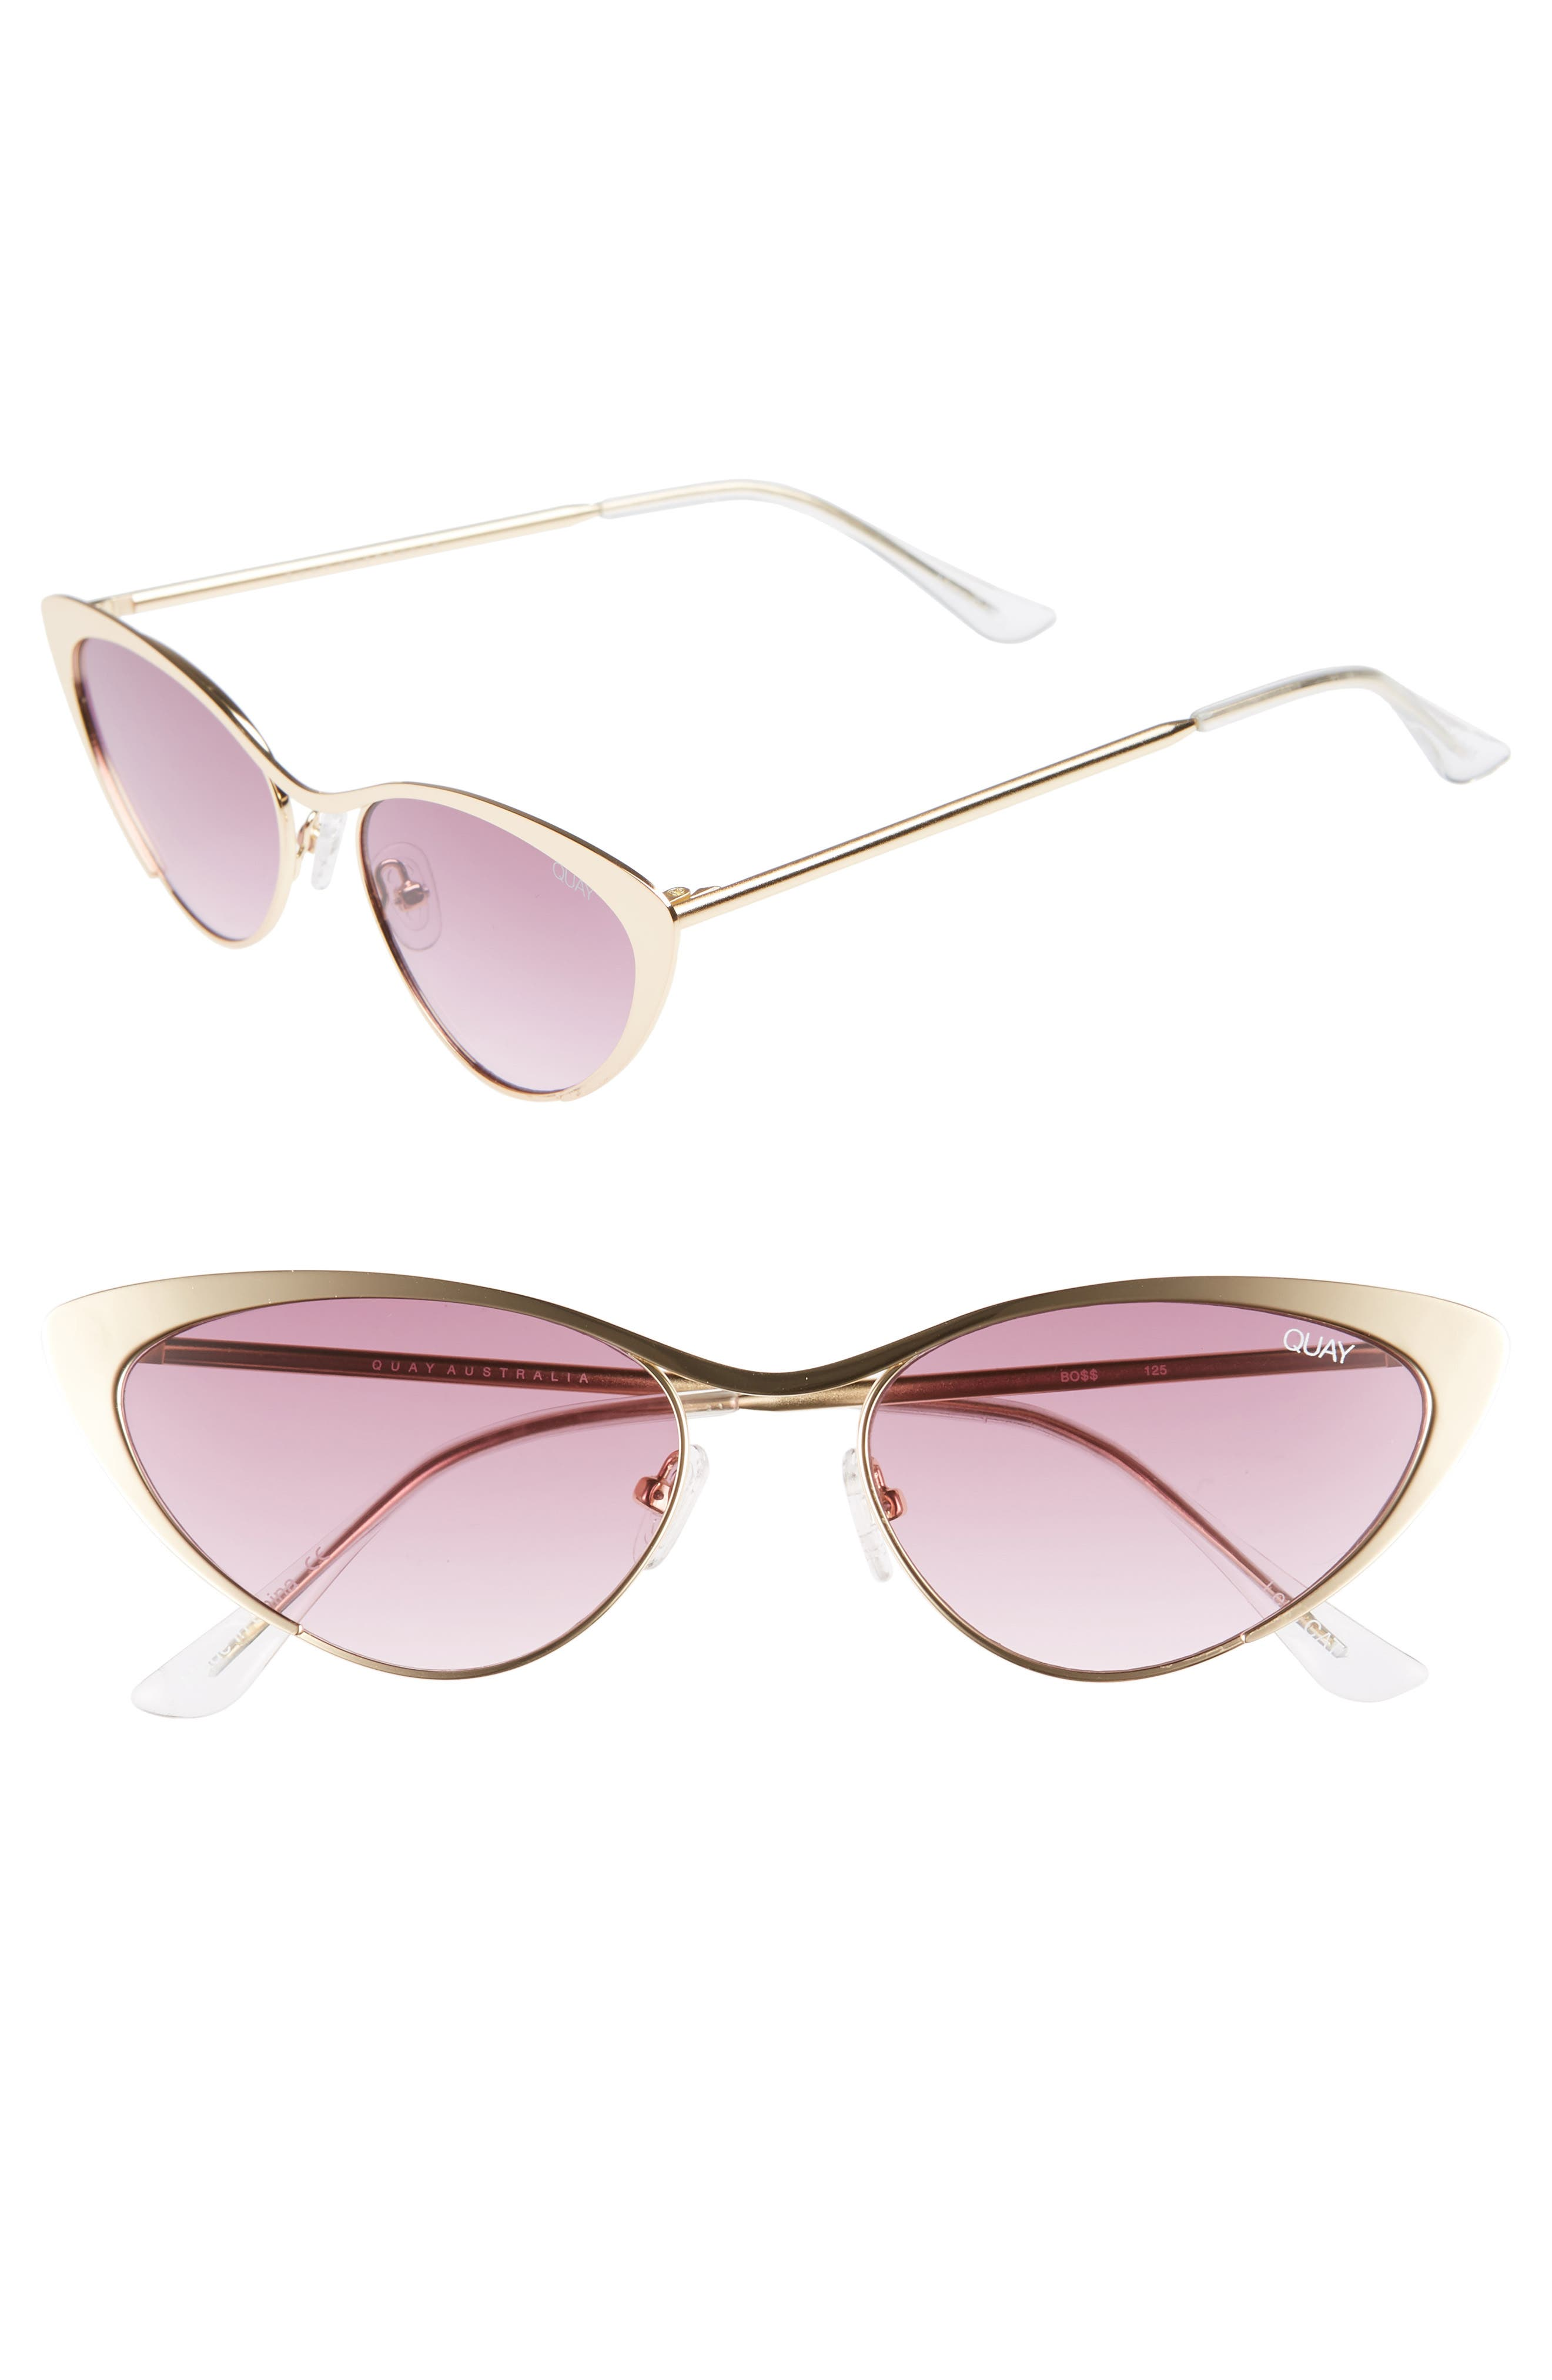 Boss 53mm Cat Eye Sunglasses,                         Main,                         color, GOLD/ PURPLE